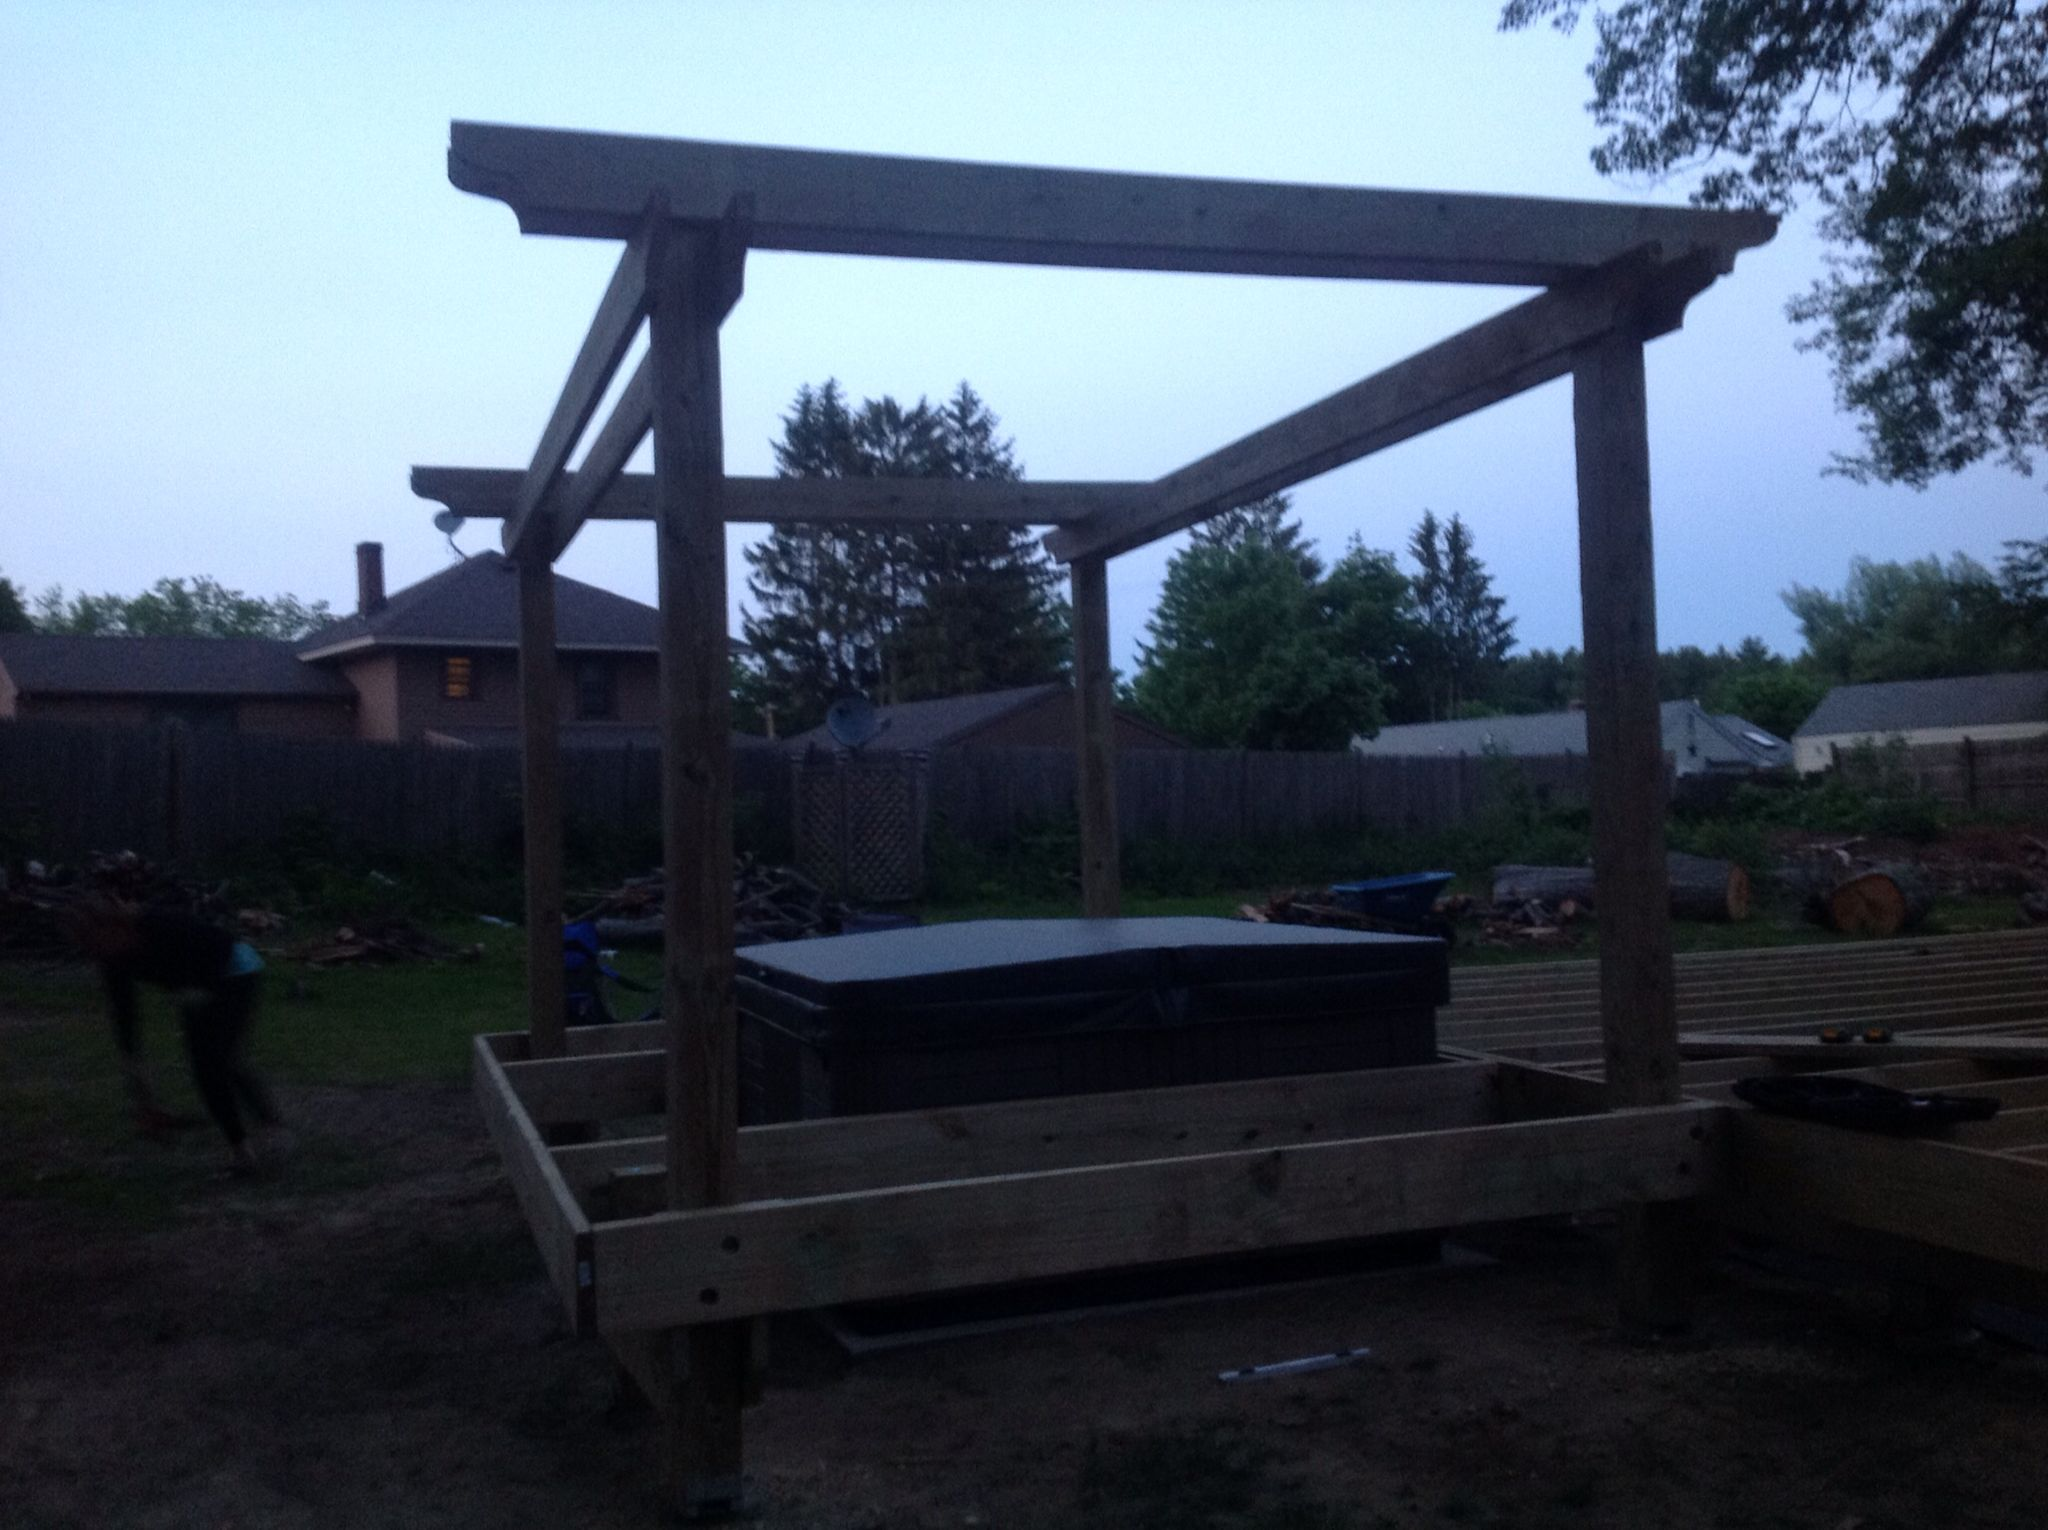 Hot tub install | Deck / Hot Tub build | Pinterest | Hot tubs, Tubs ...